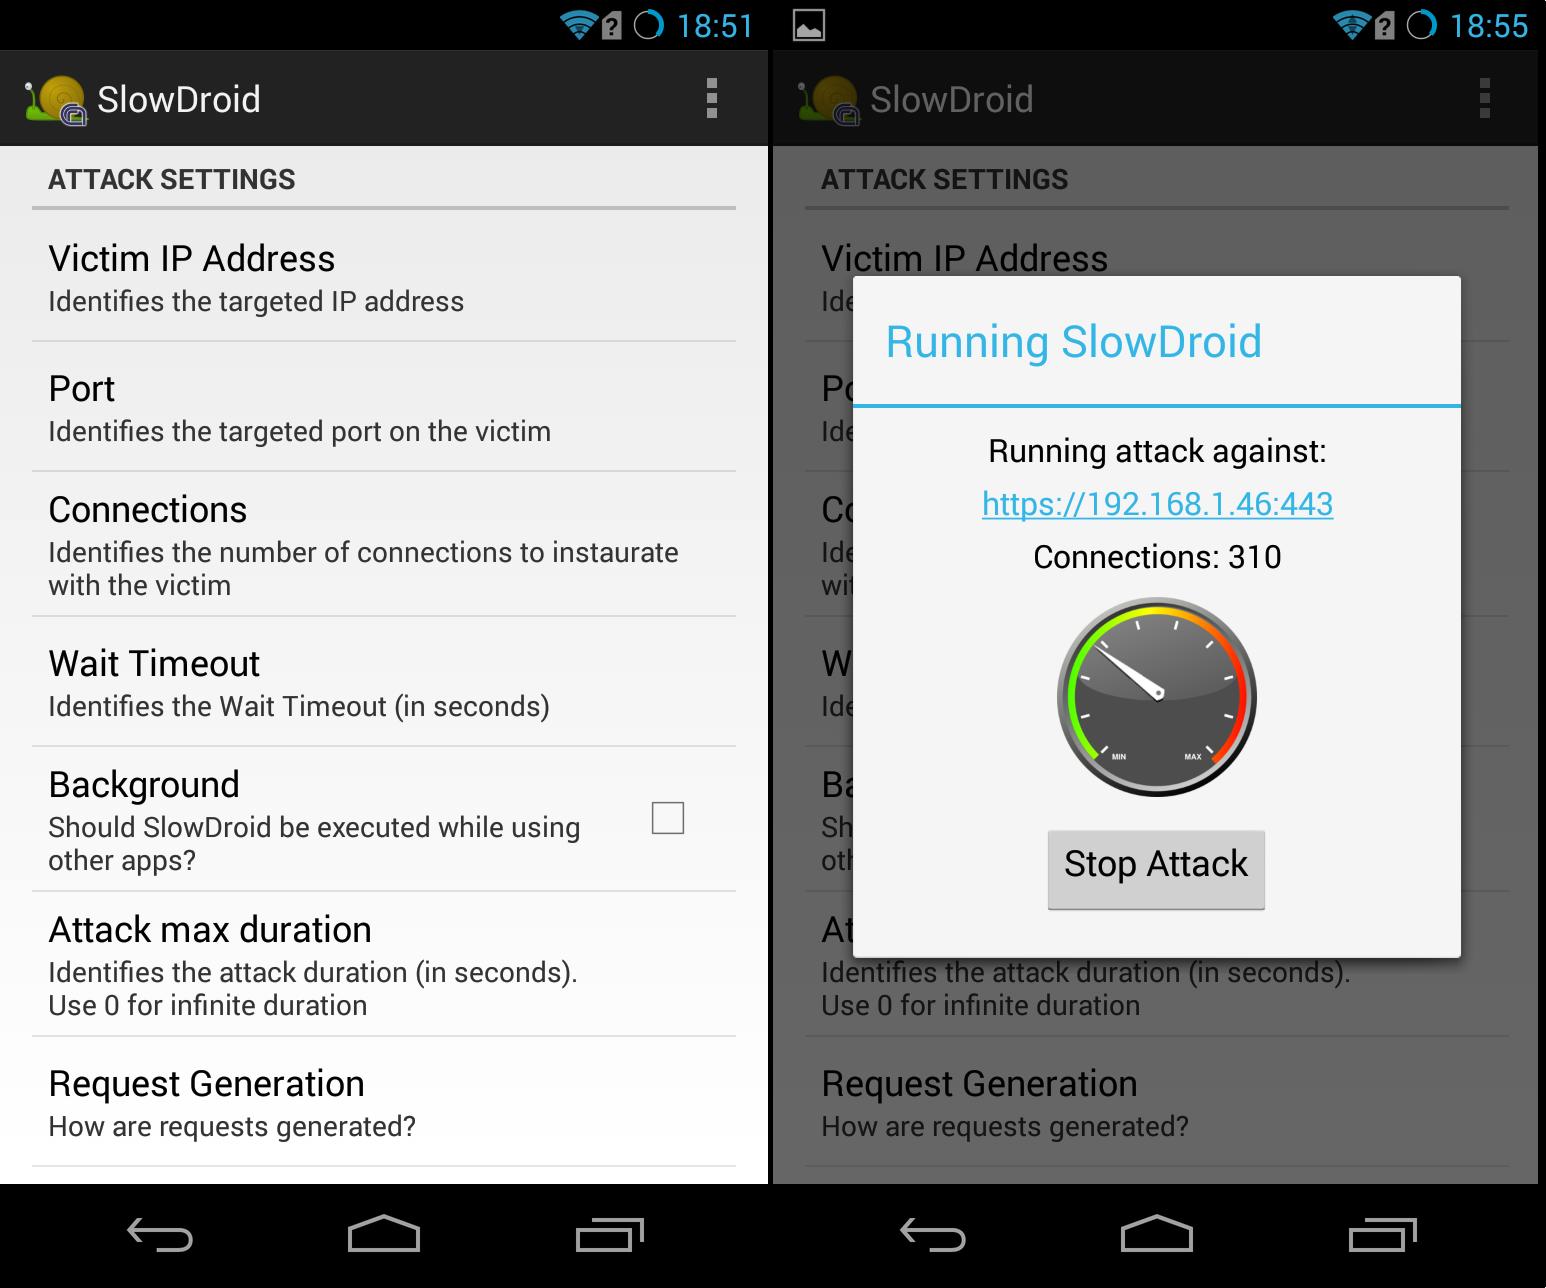 SlowDroid Screenshot